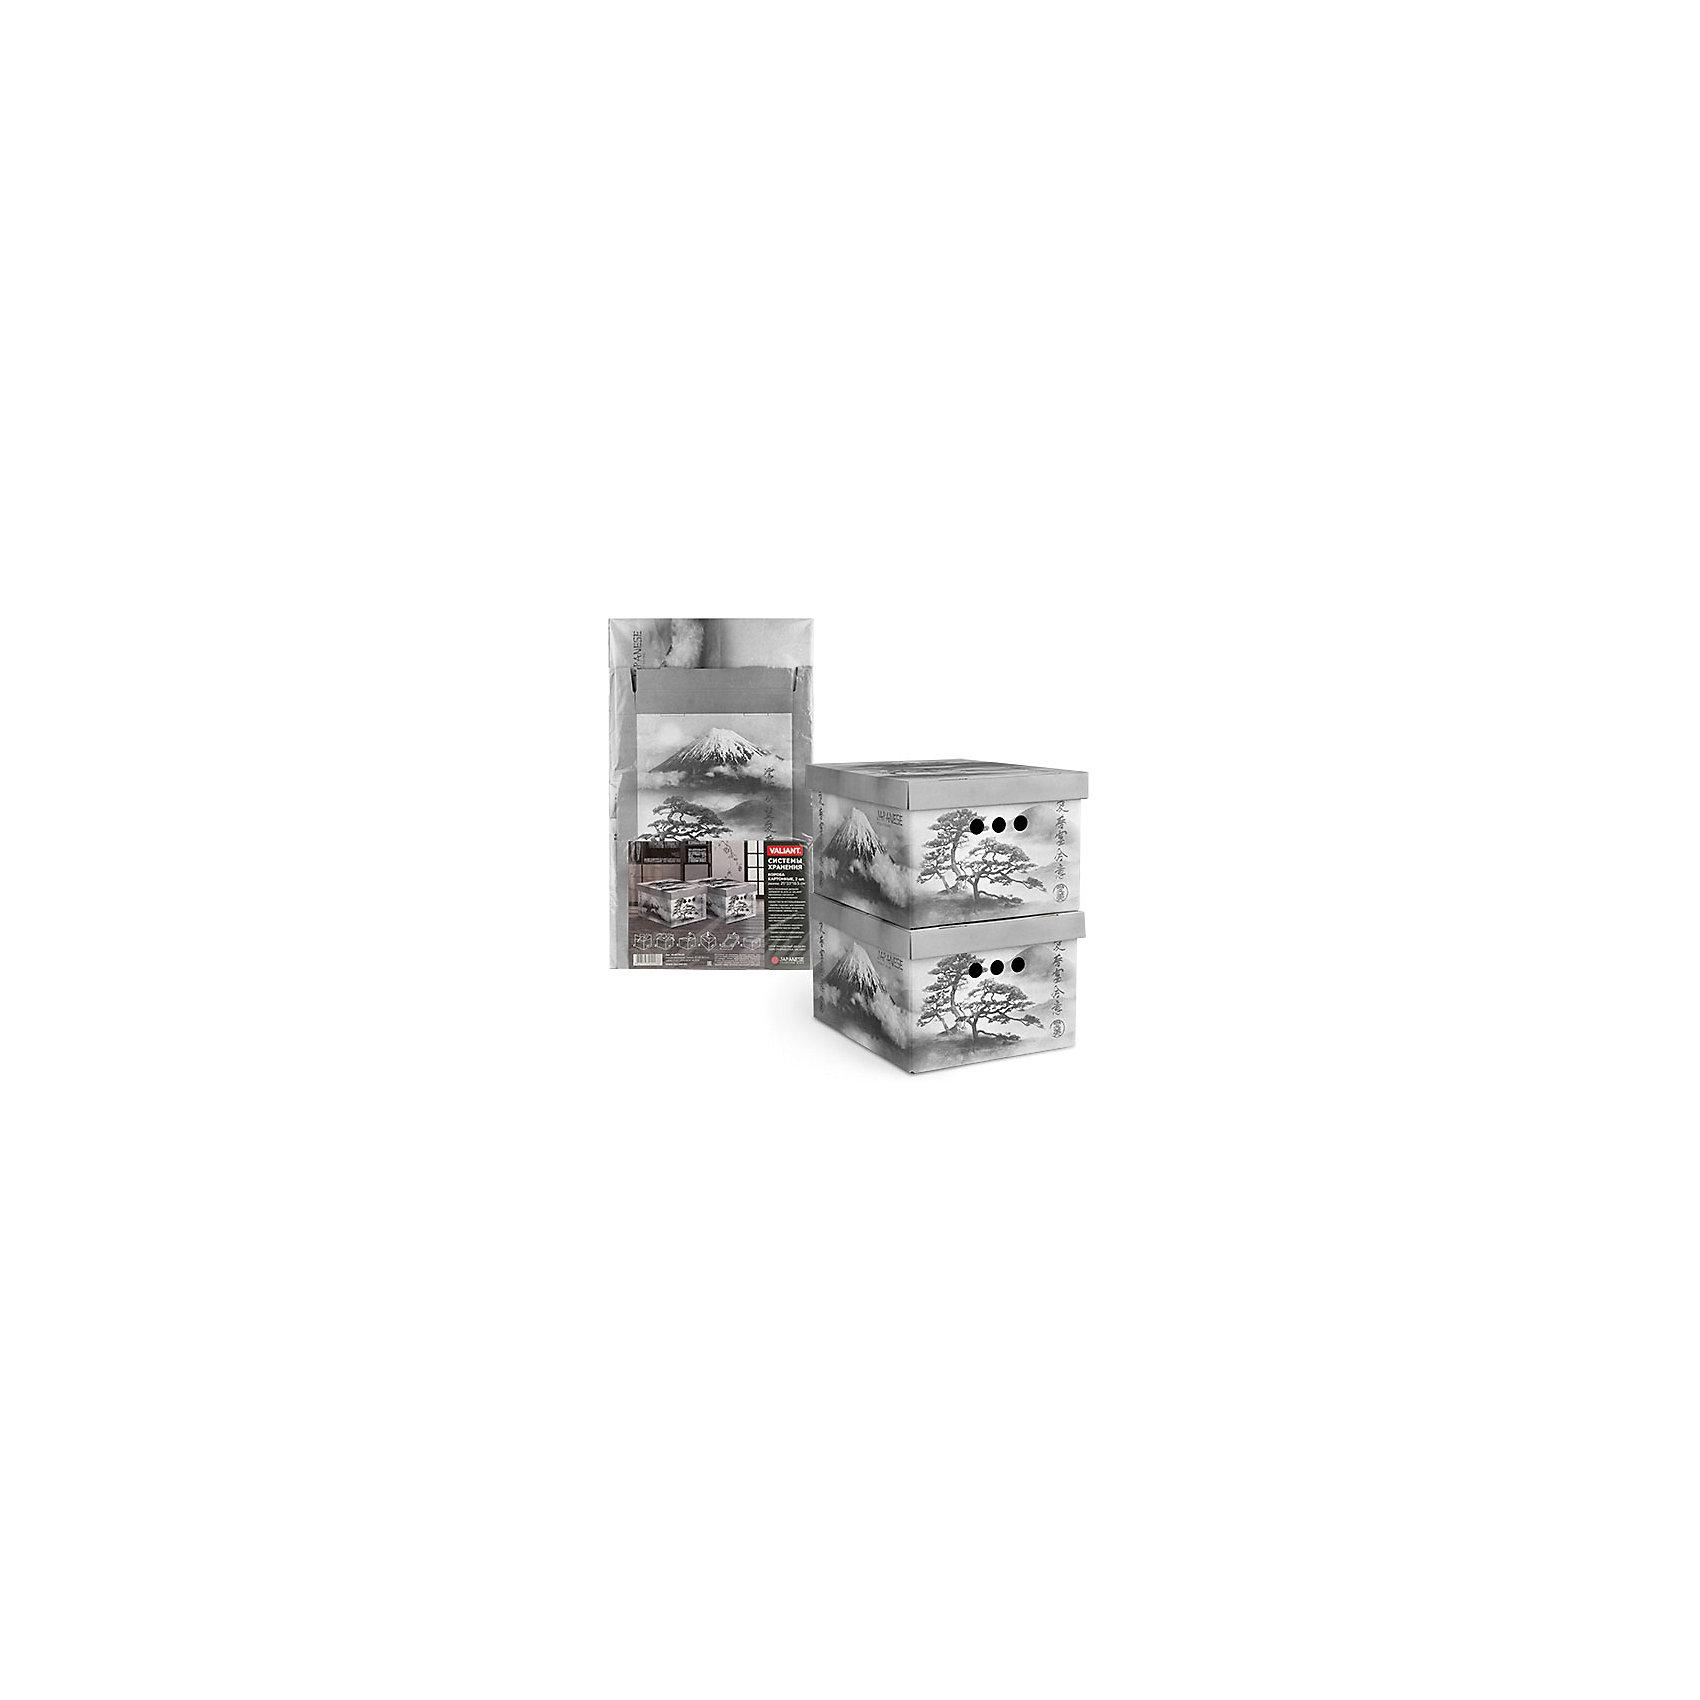 VALIANT Короб картонный, складной, малый, 25*33*18.5 см, 2 шт., JAPANESE BLACK, Valiant